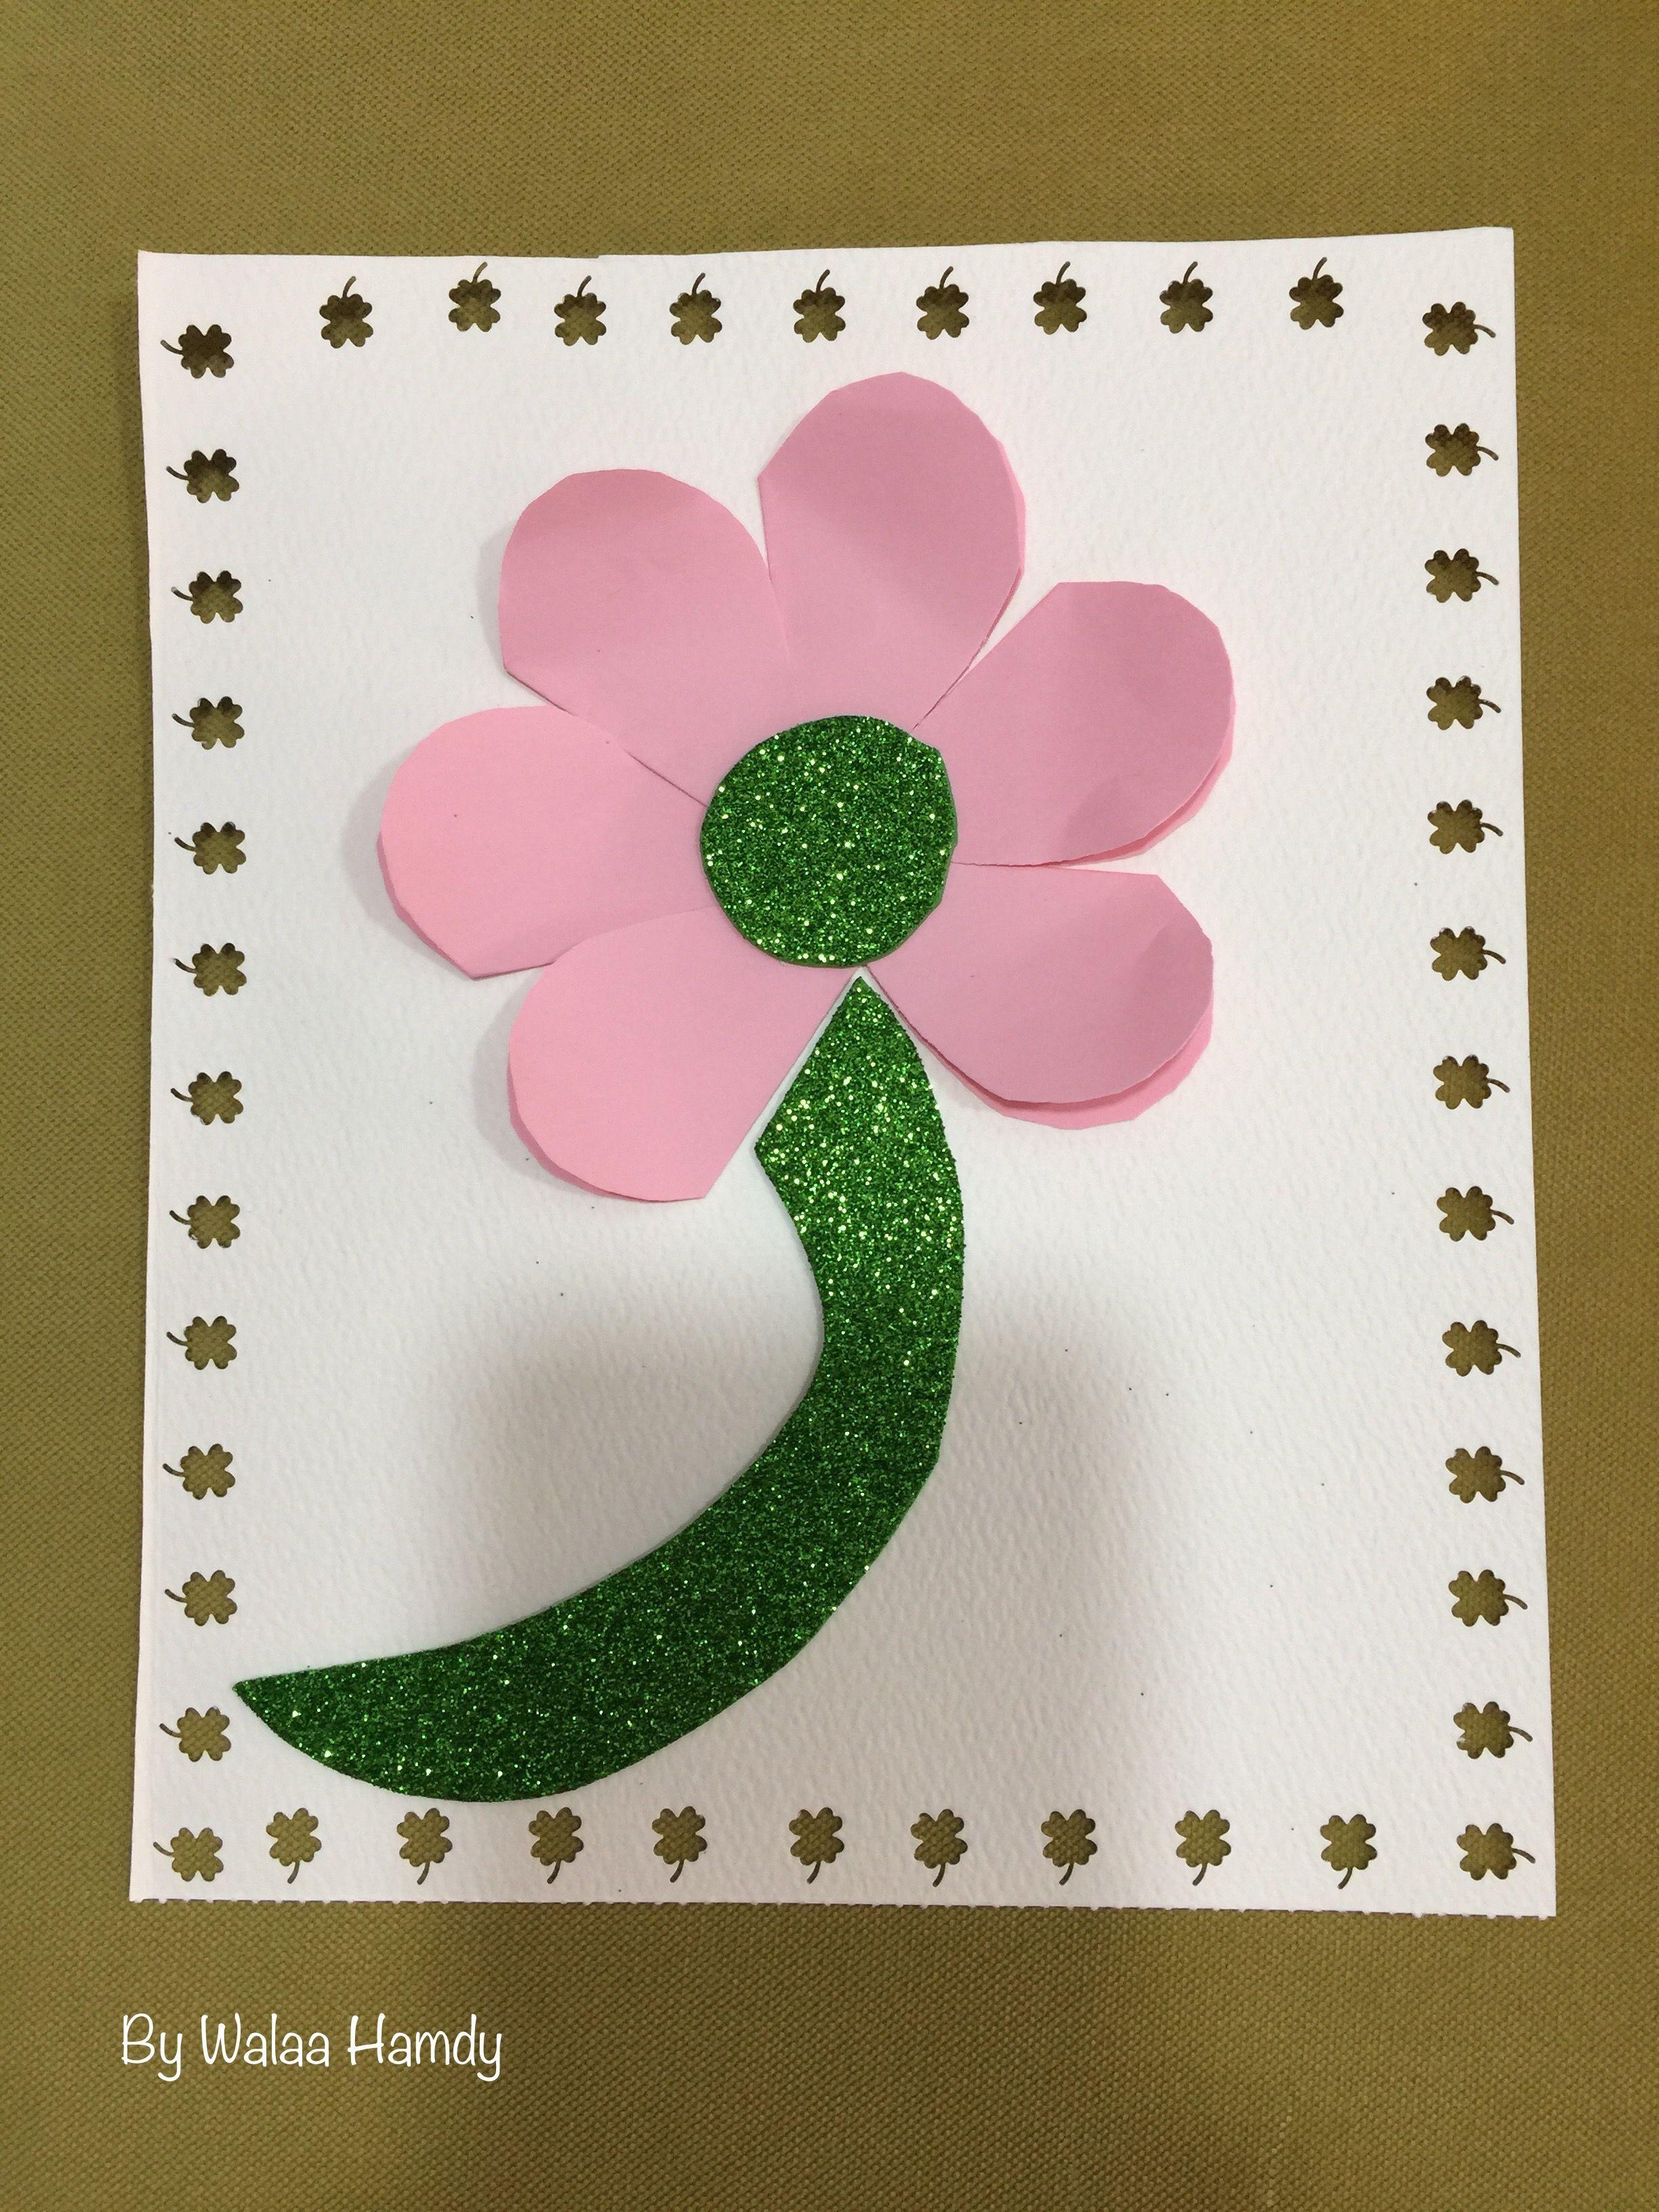 نشاط حرف الزين ز زهرة Learnarabicactivities Alphabet Crafts Arabic Alphabet Letter A Crafts